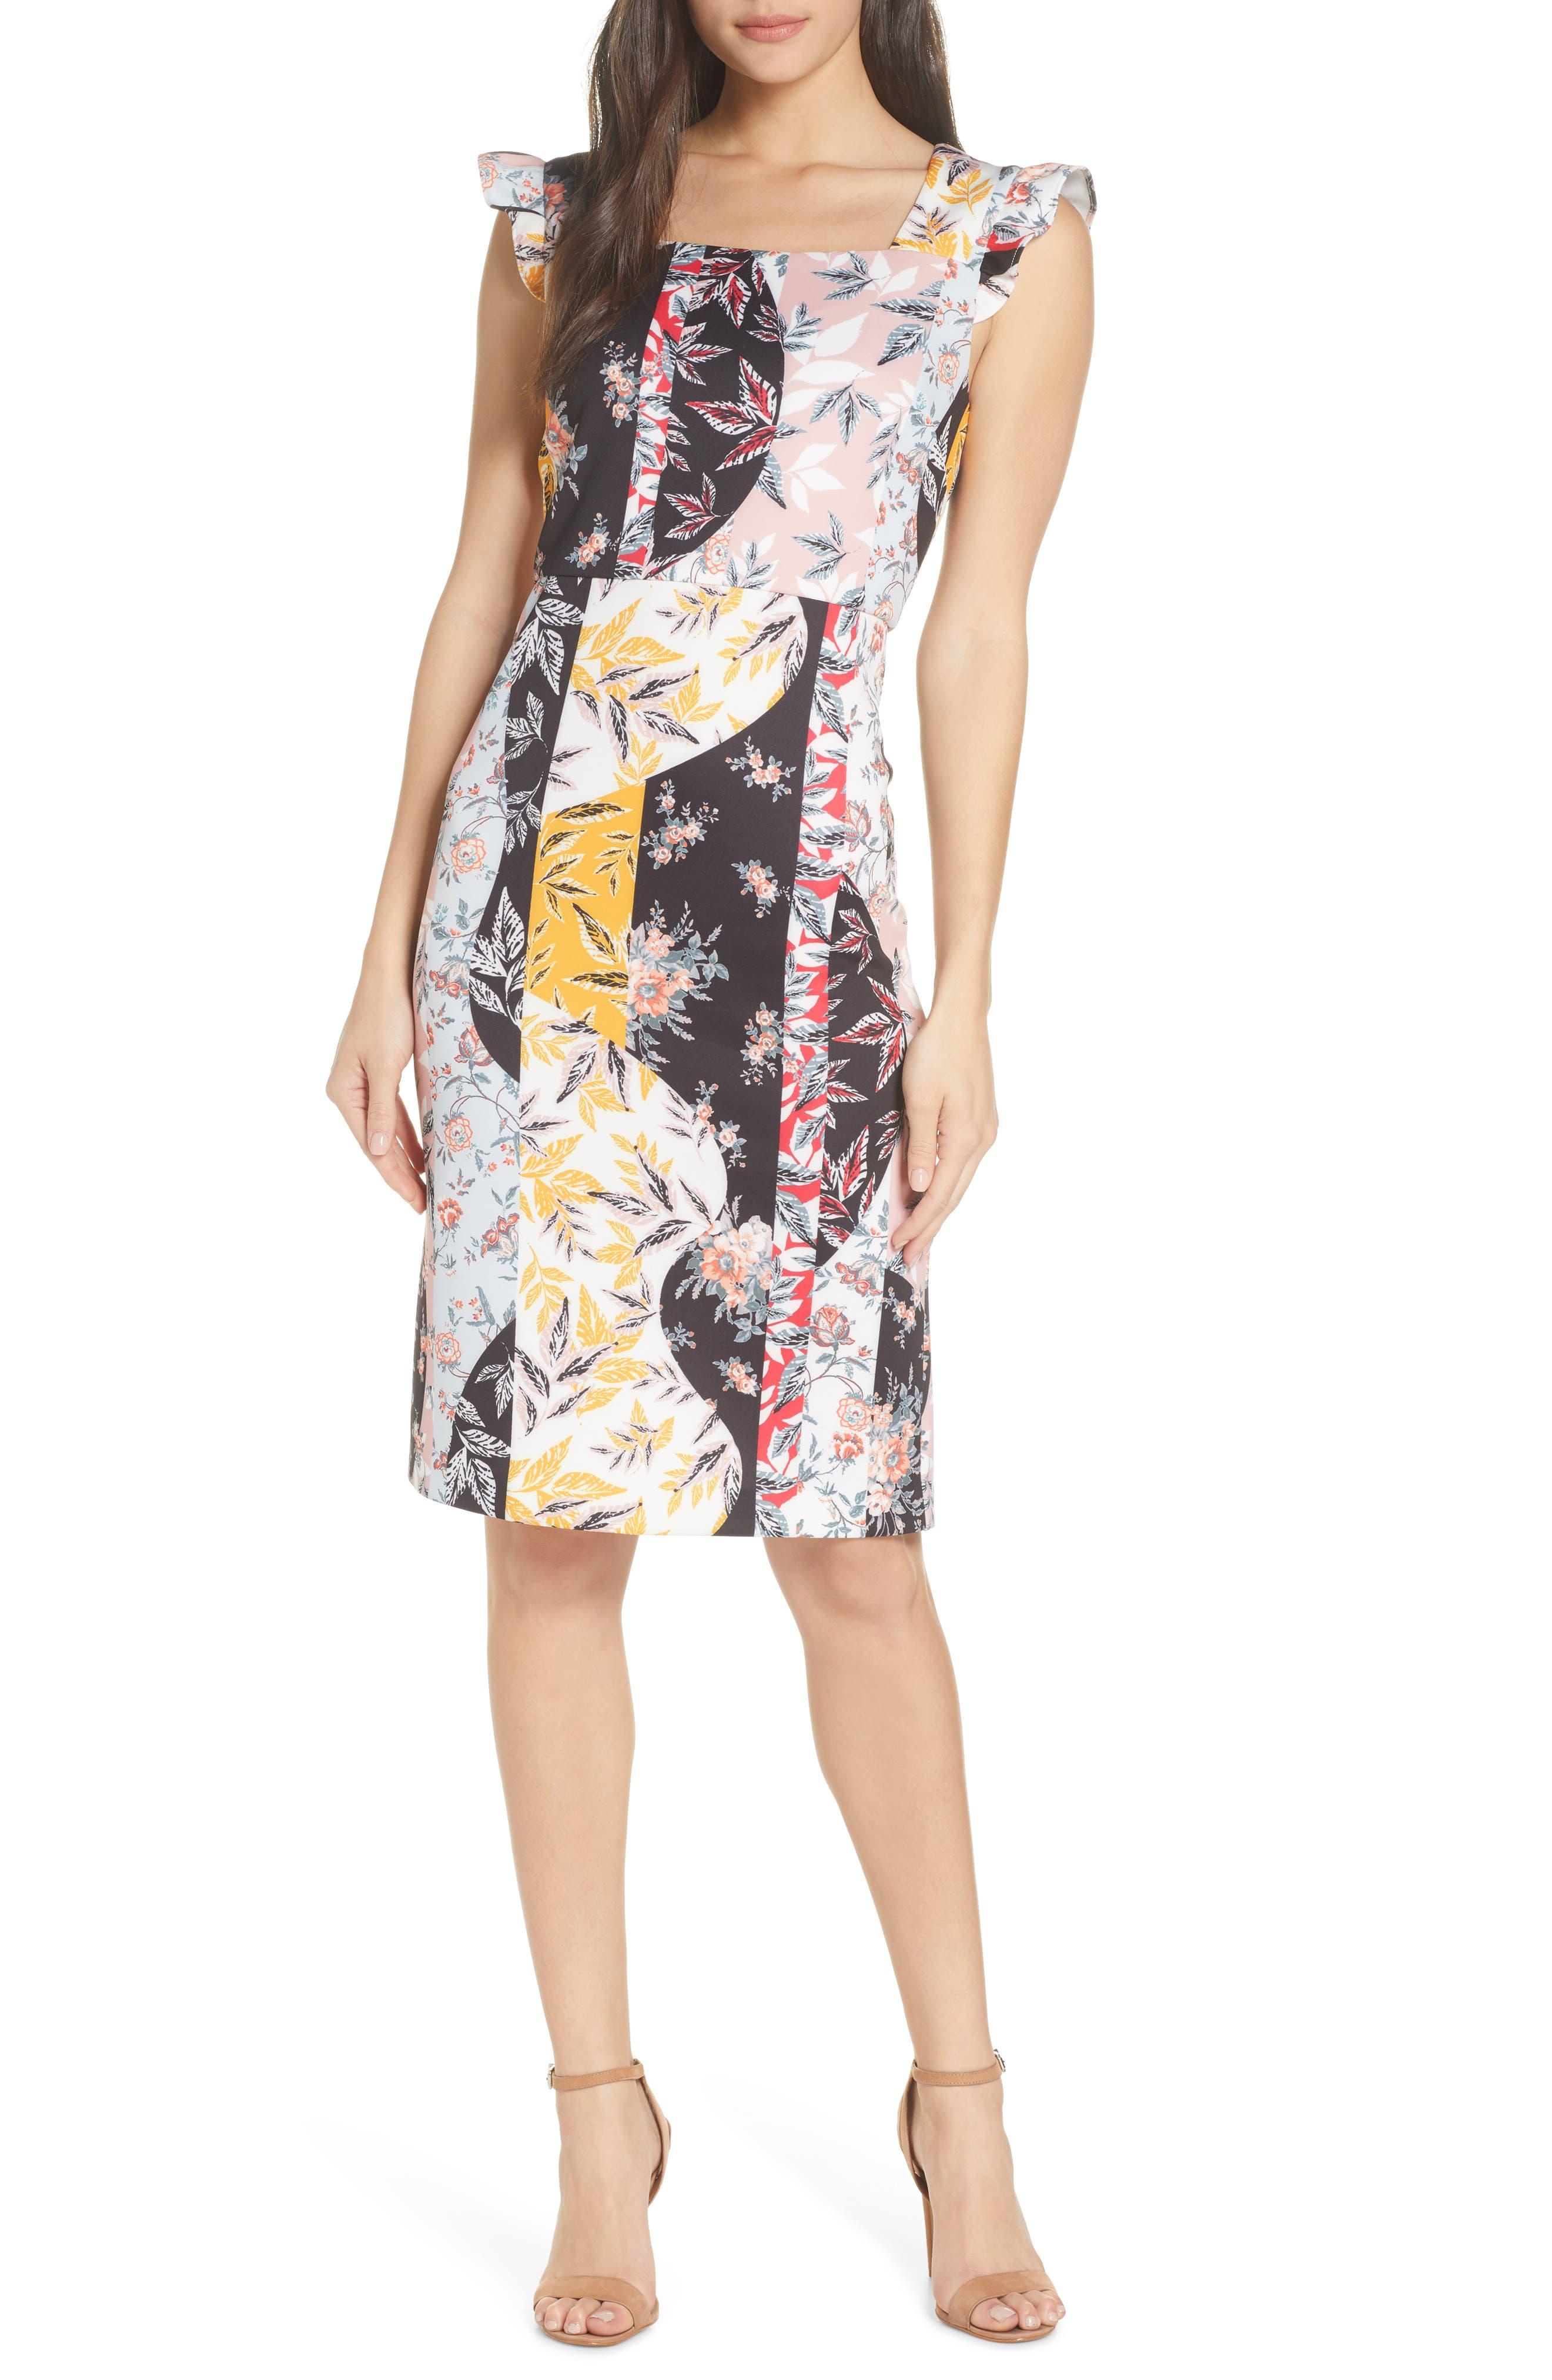 Sam Edelman Floral Print Scuba Sheath Dress, Ivory